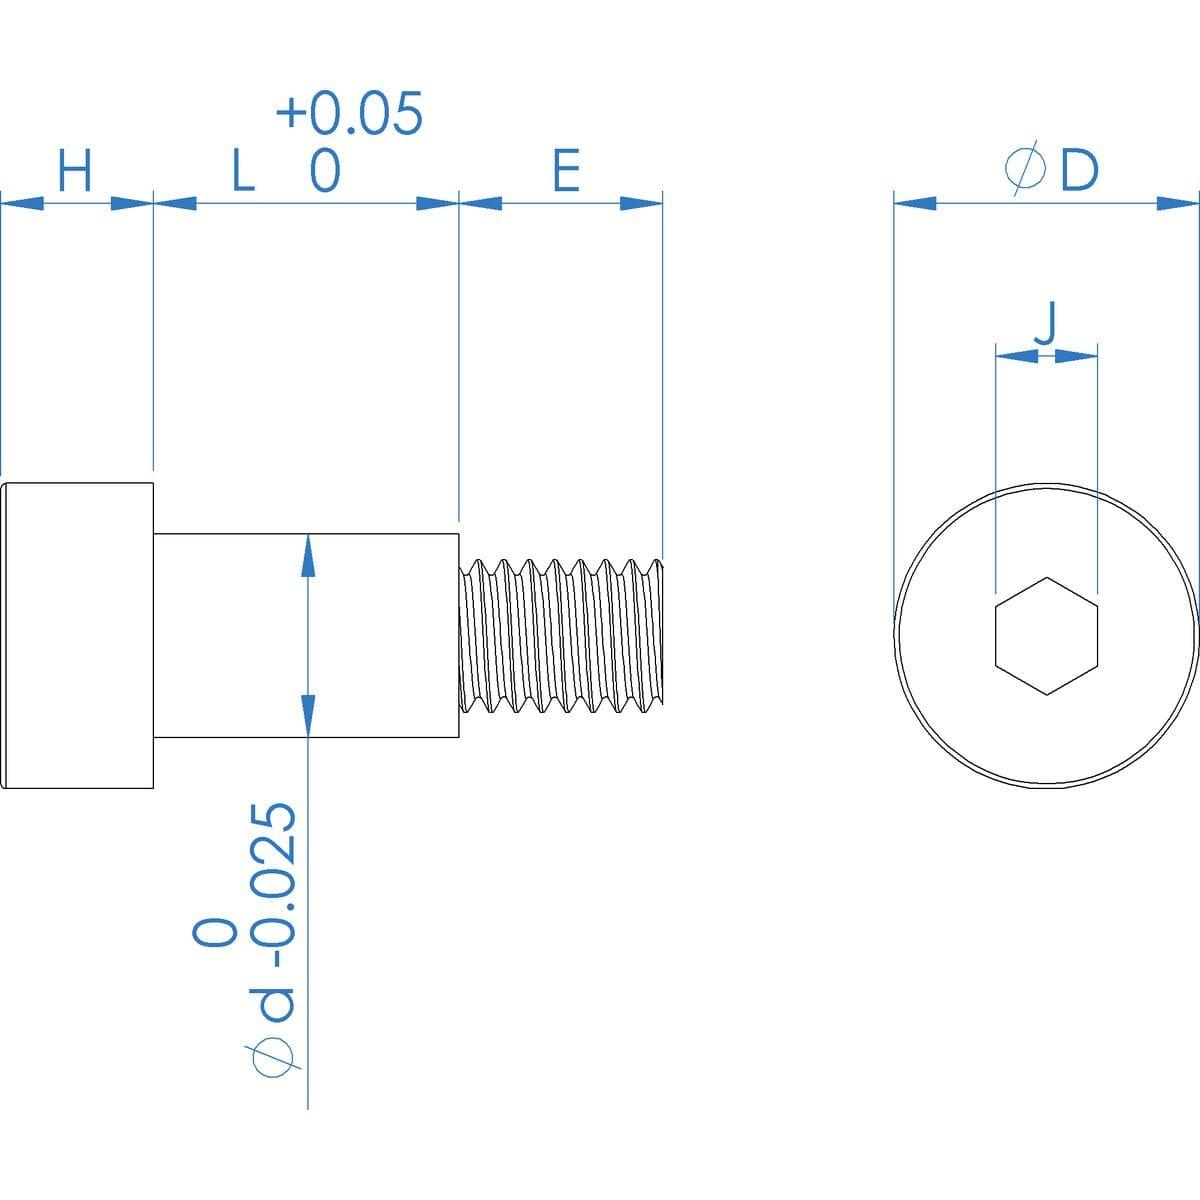 Class 12.9 Steel Black Oxide Recess=4mm Metric Holo-Krome 100pcs Hex Socket Drive M6-1.0 X 20mm Shoulder Screws Shoulder=8mm Brand Ships FREE in USA by Aspen Fasteners r